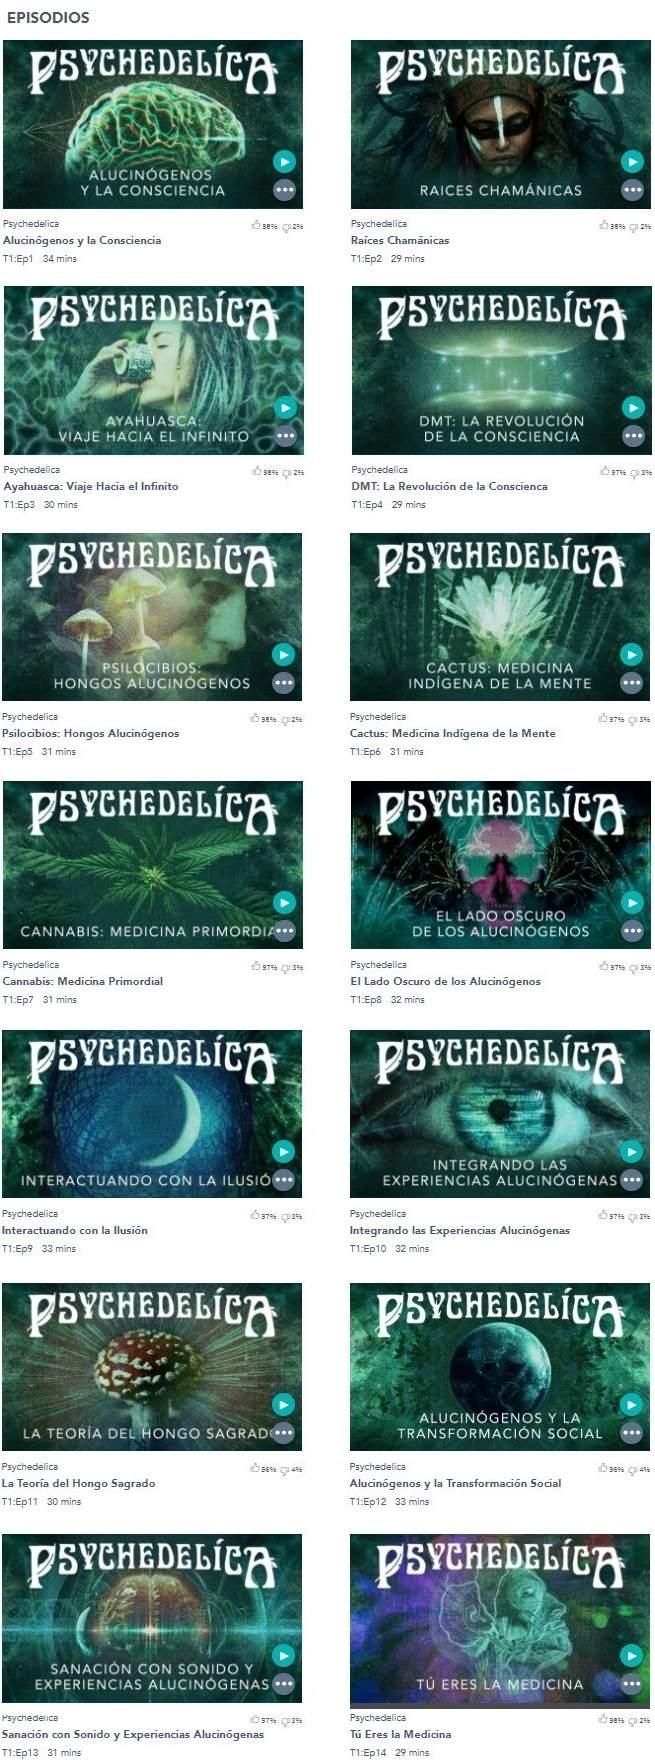 ayahuasca, dmt, alucinogenos